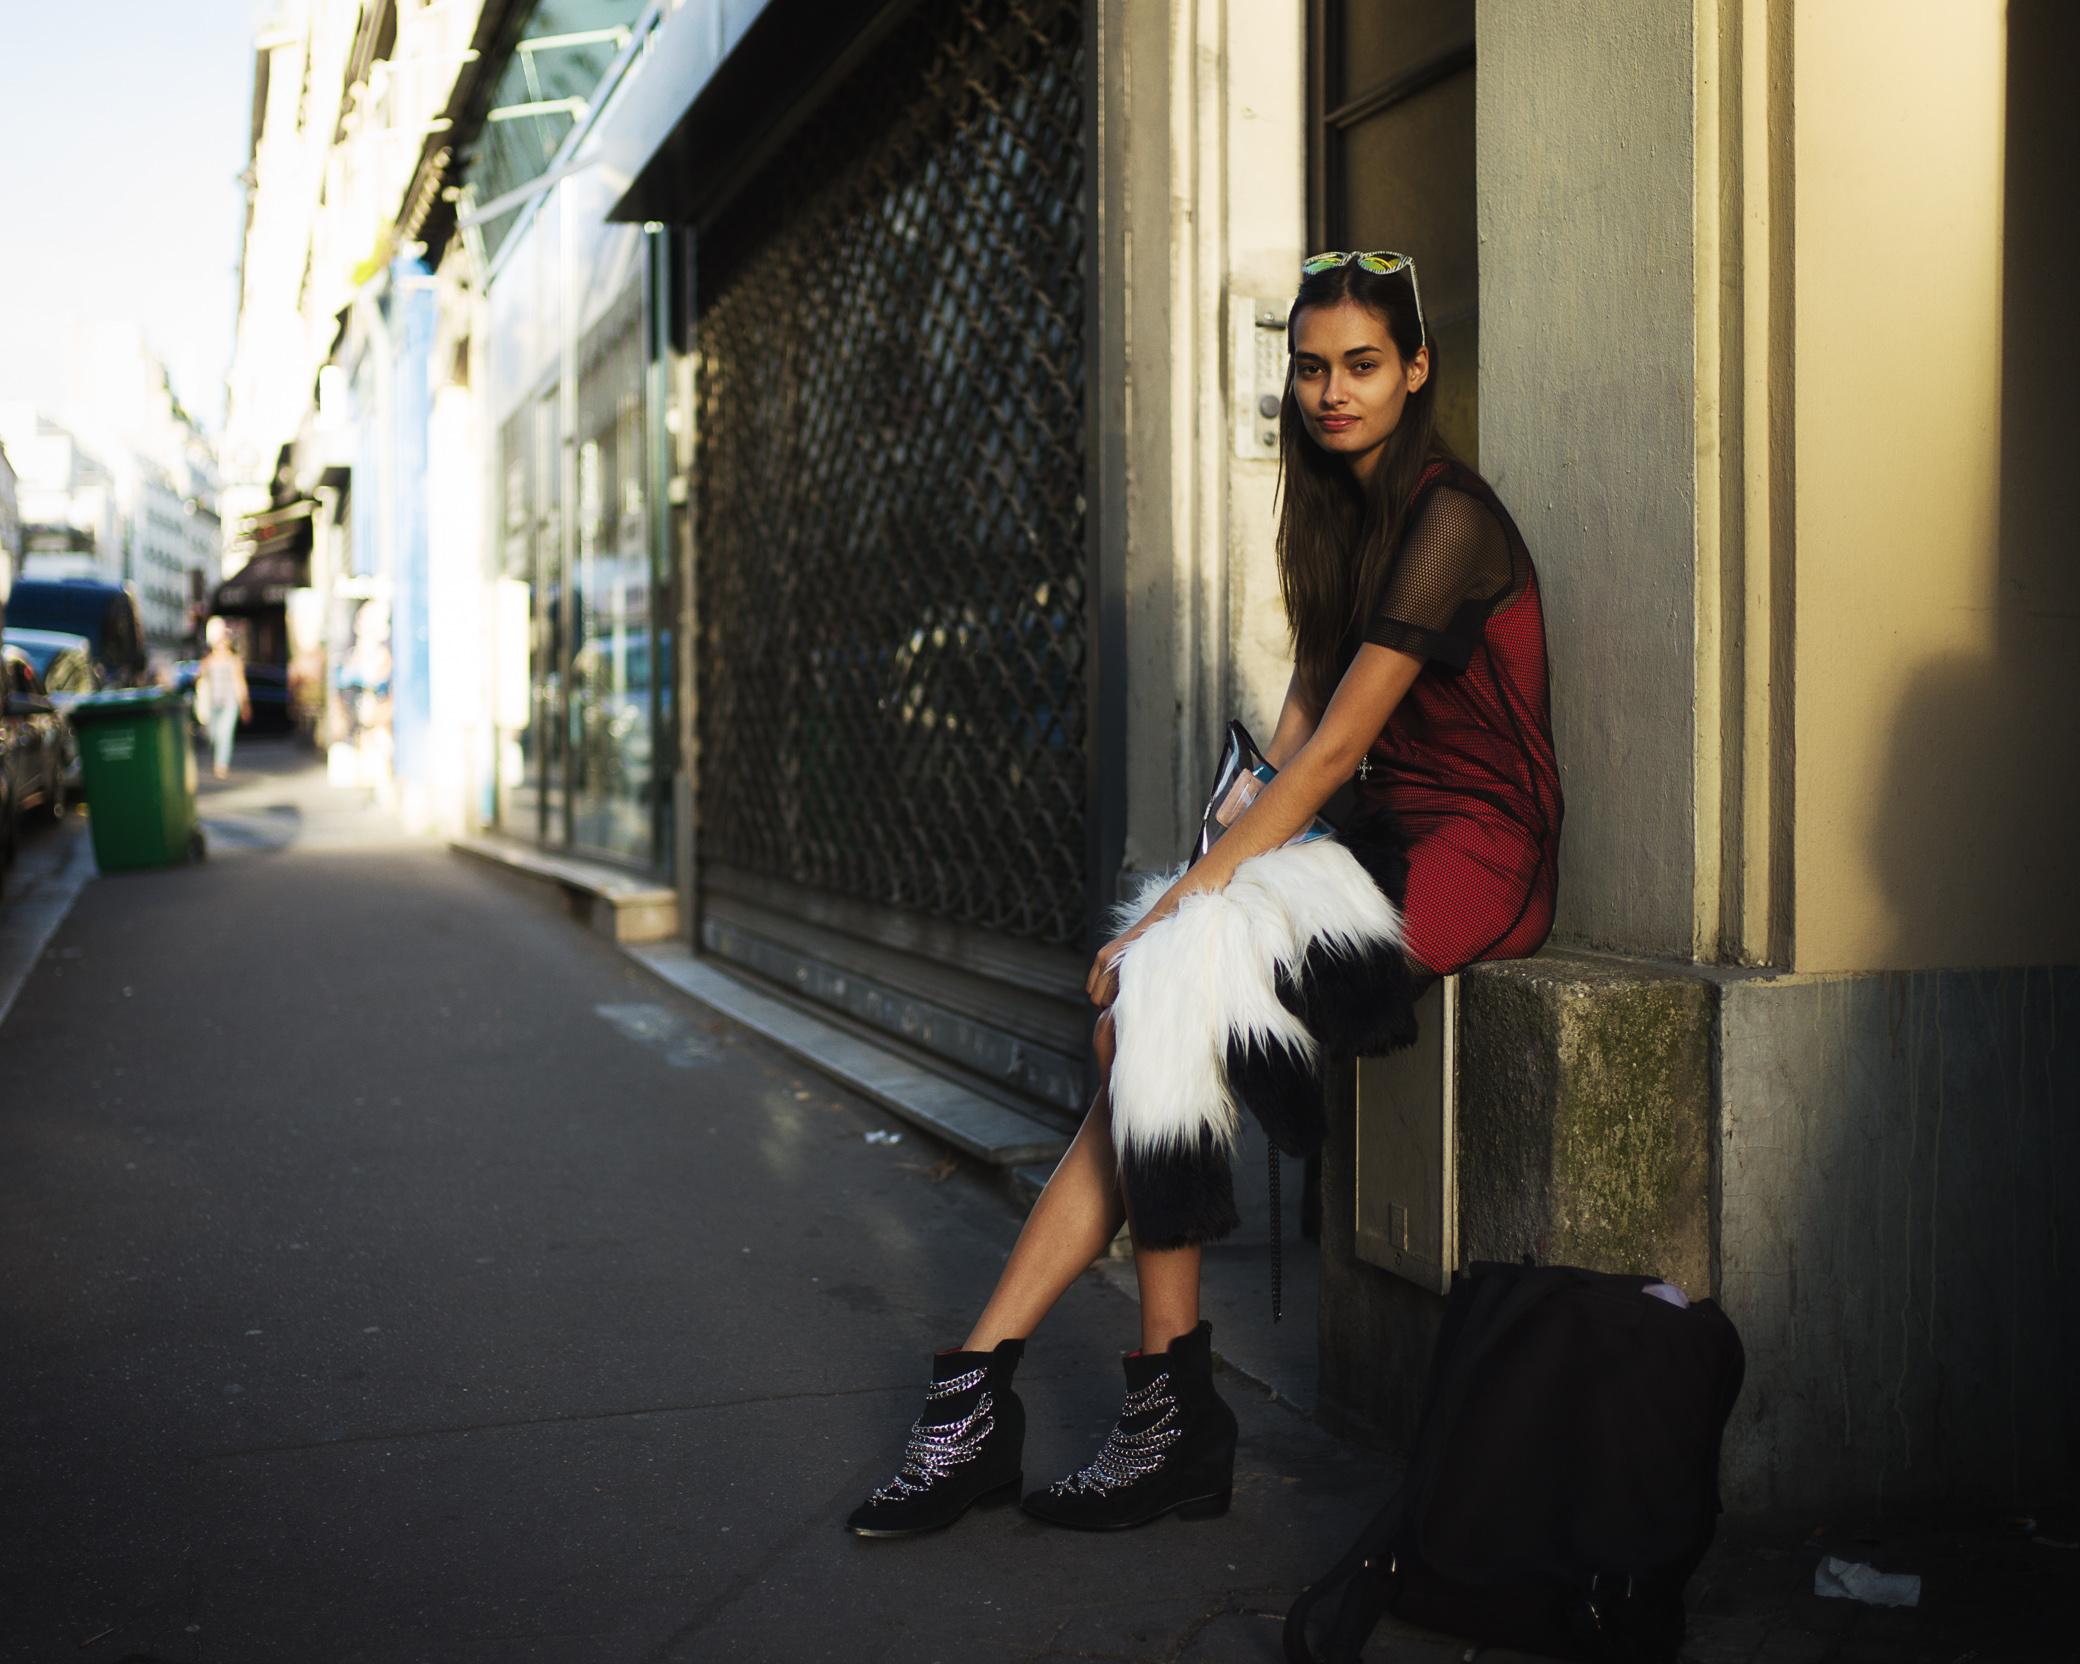 Paris, September 2014